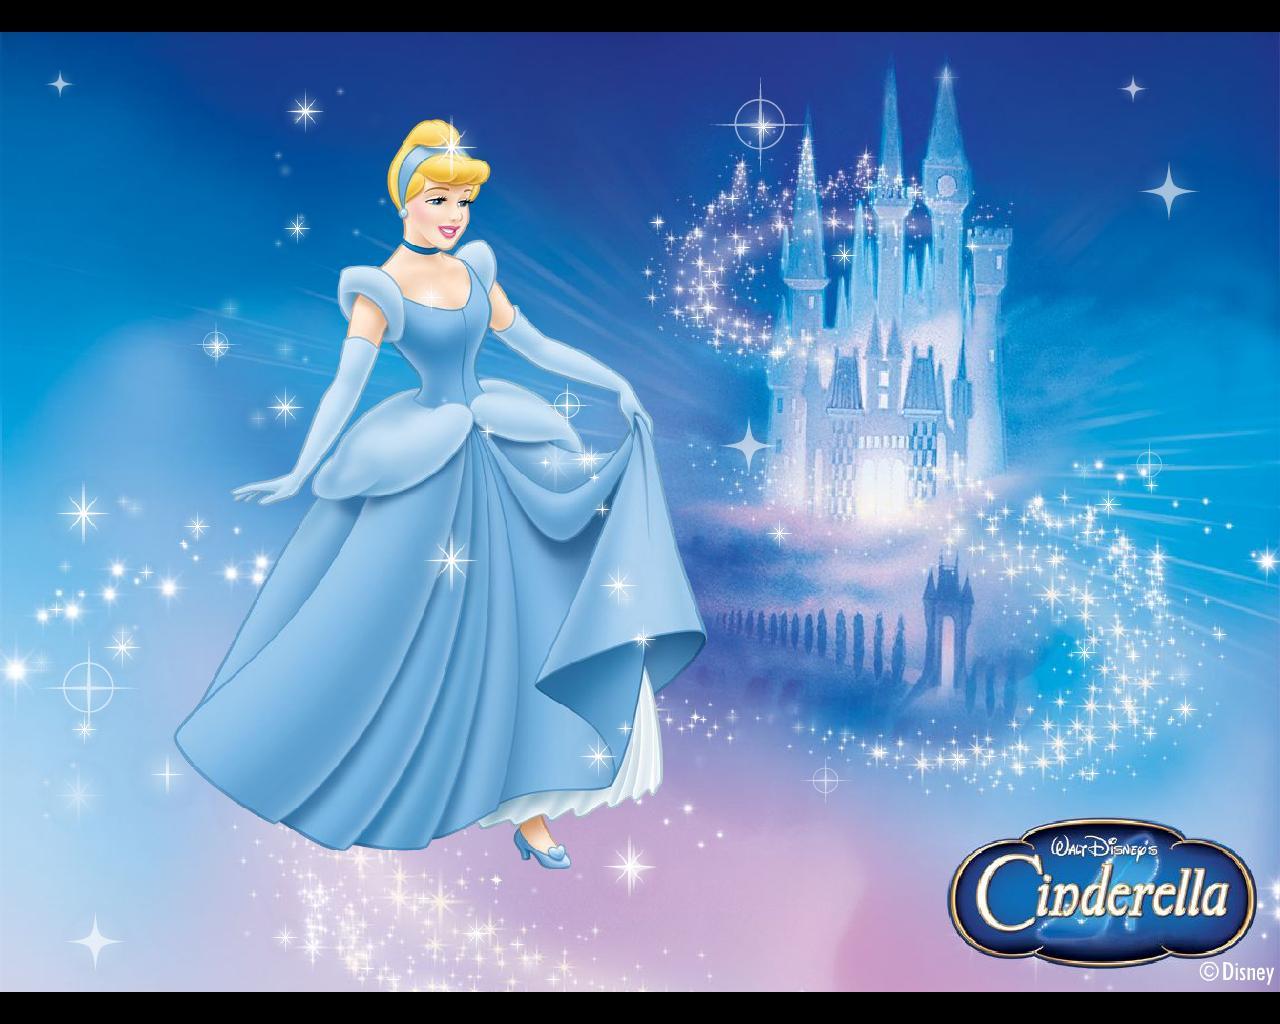 Cinderella Wallpapers Top Free Cinderella Backgrounds